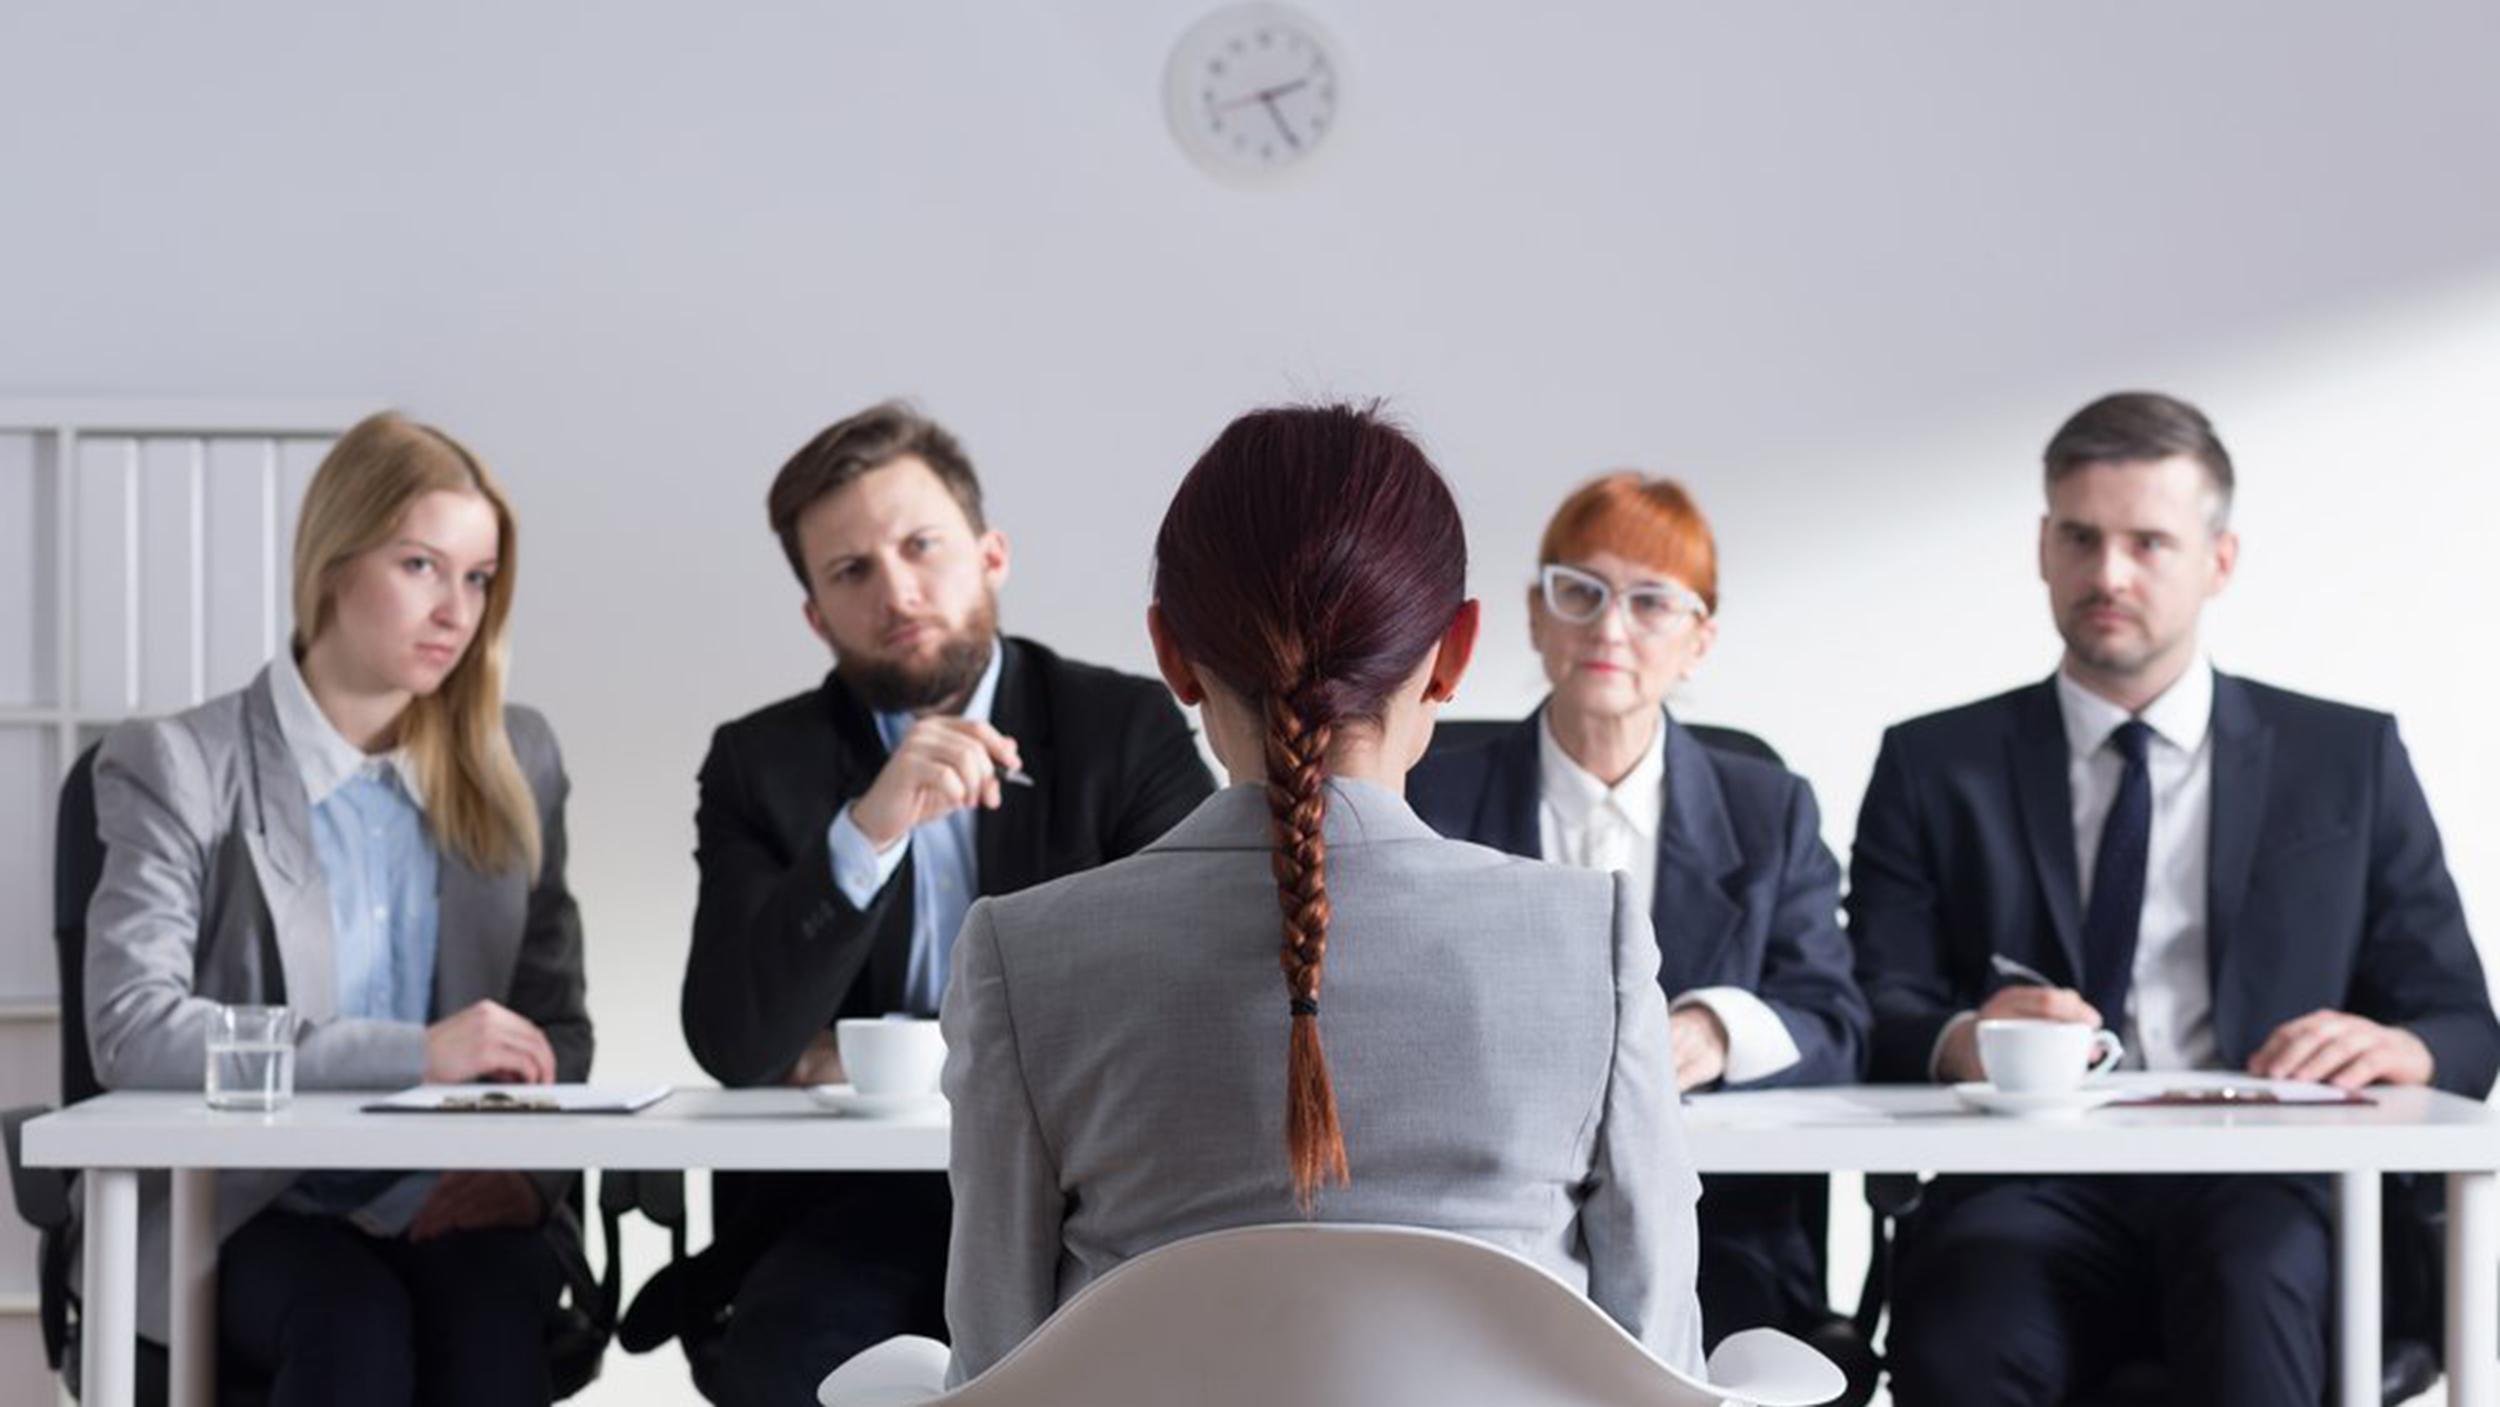 27 tough job interview questions according to Glassdoor